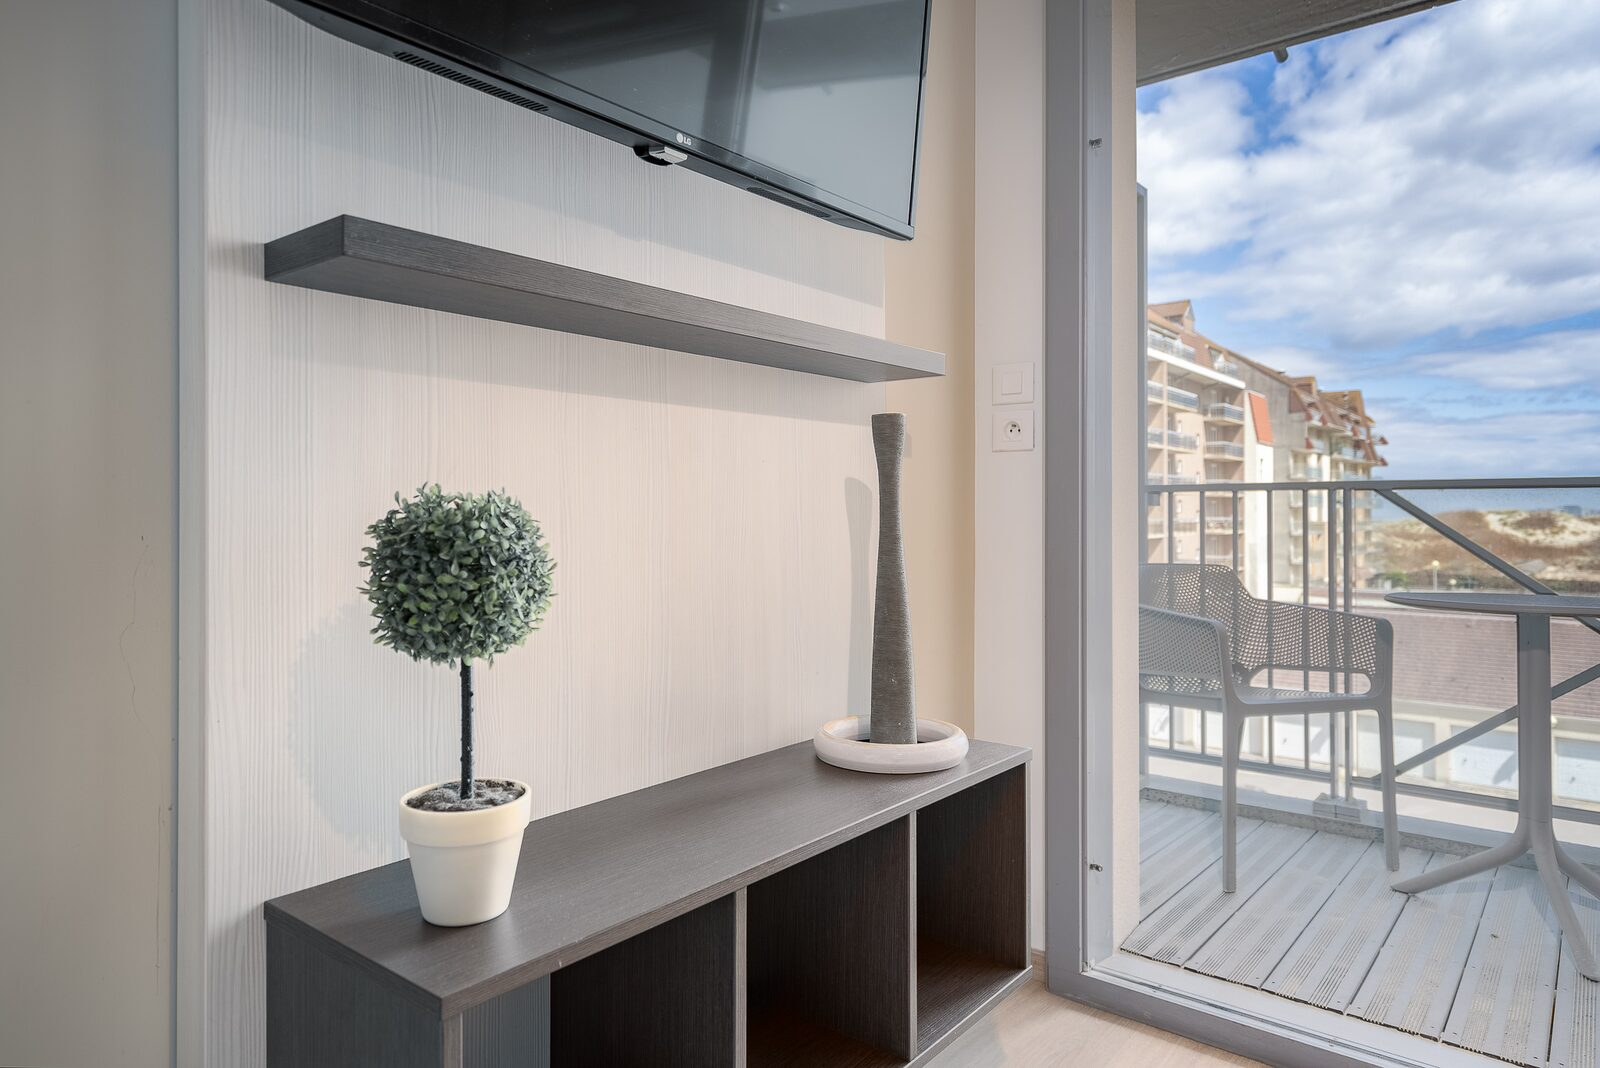 Studio for 4 people with balcony